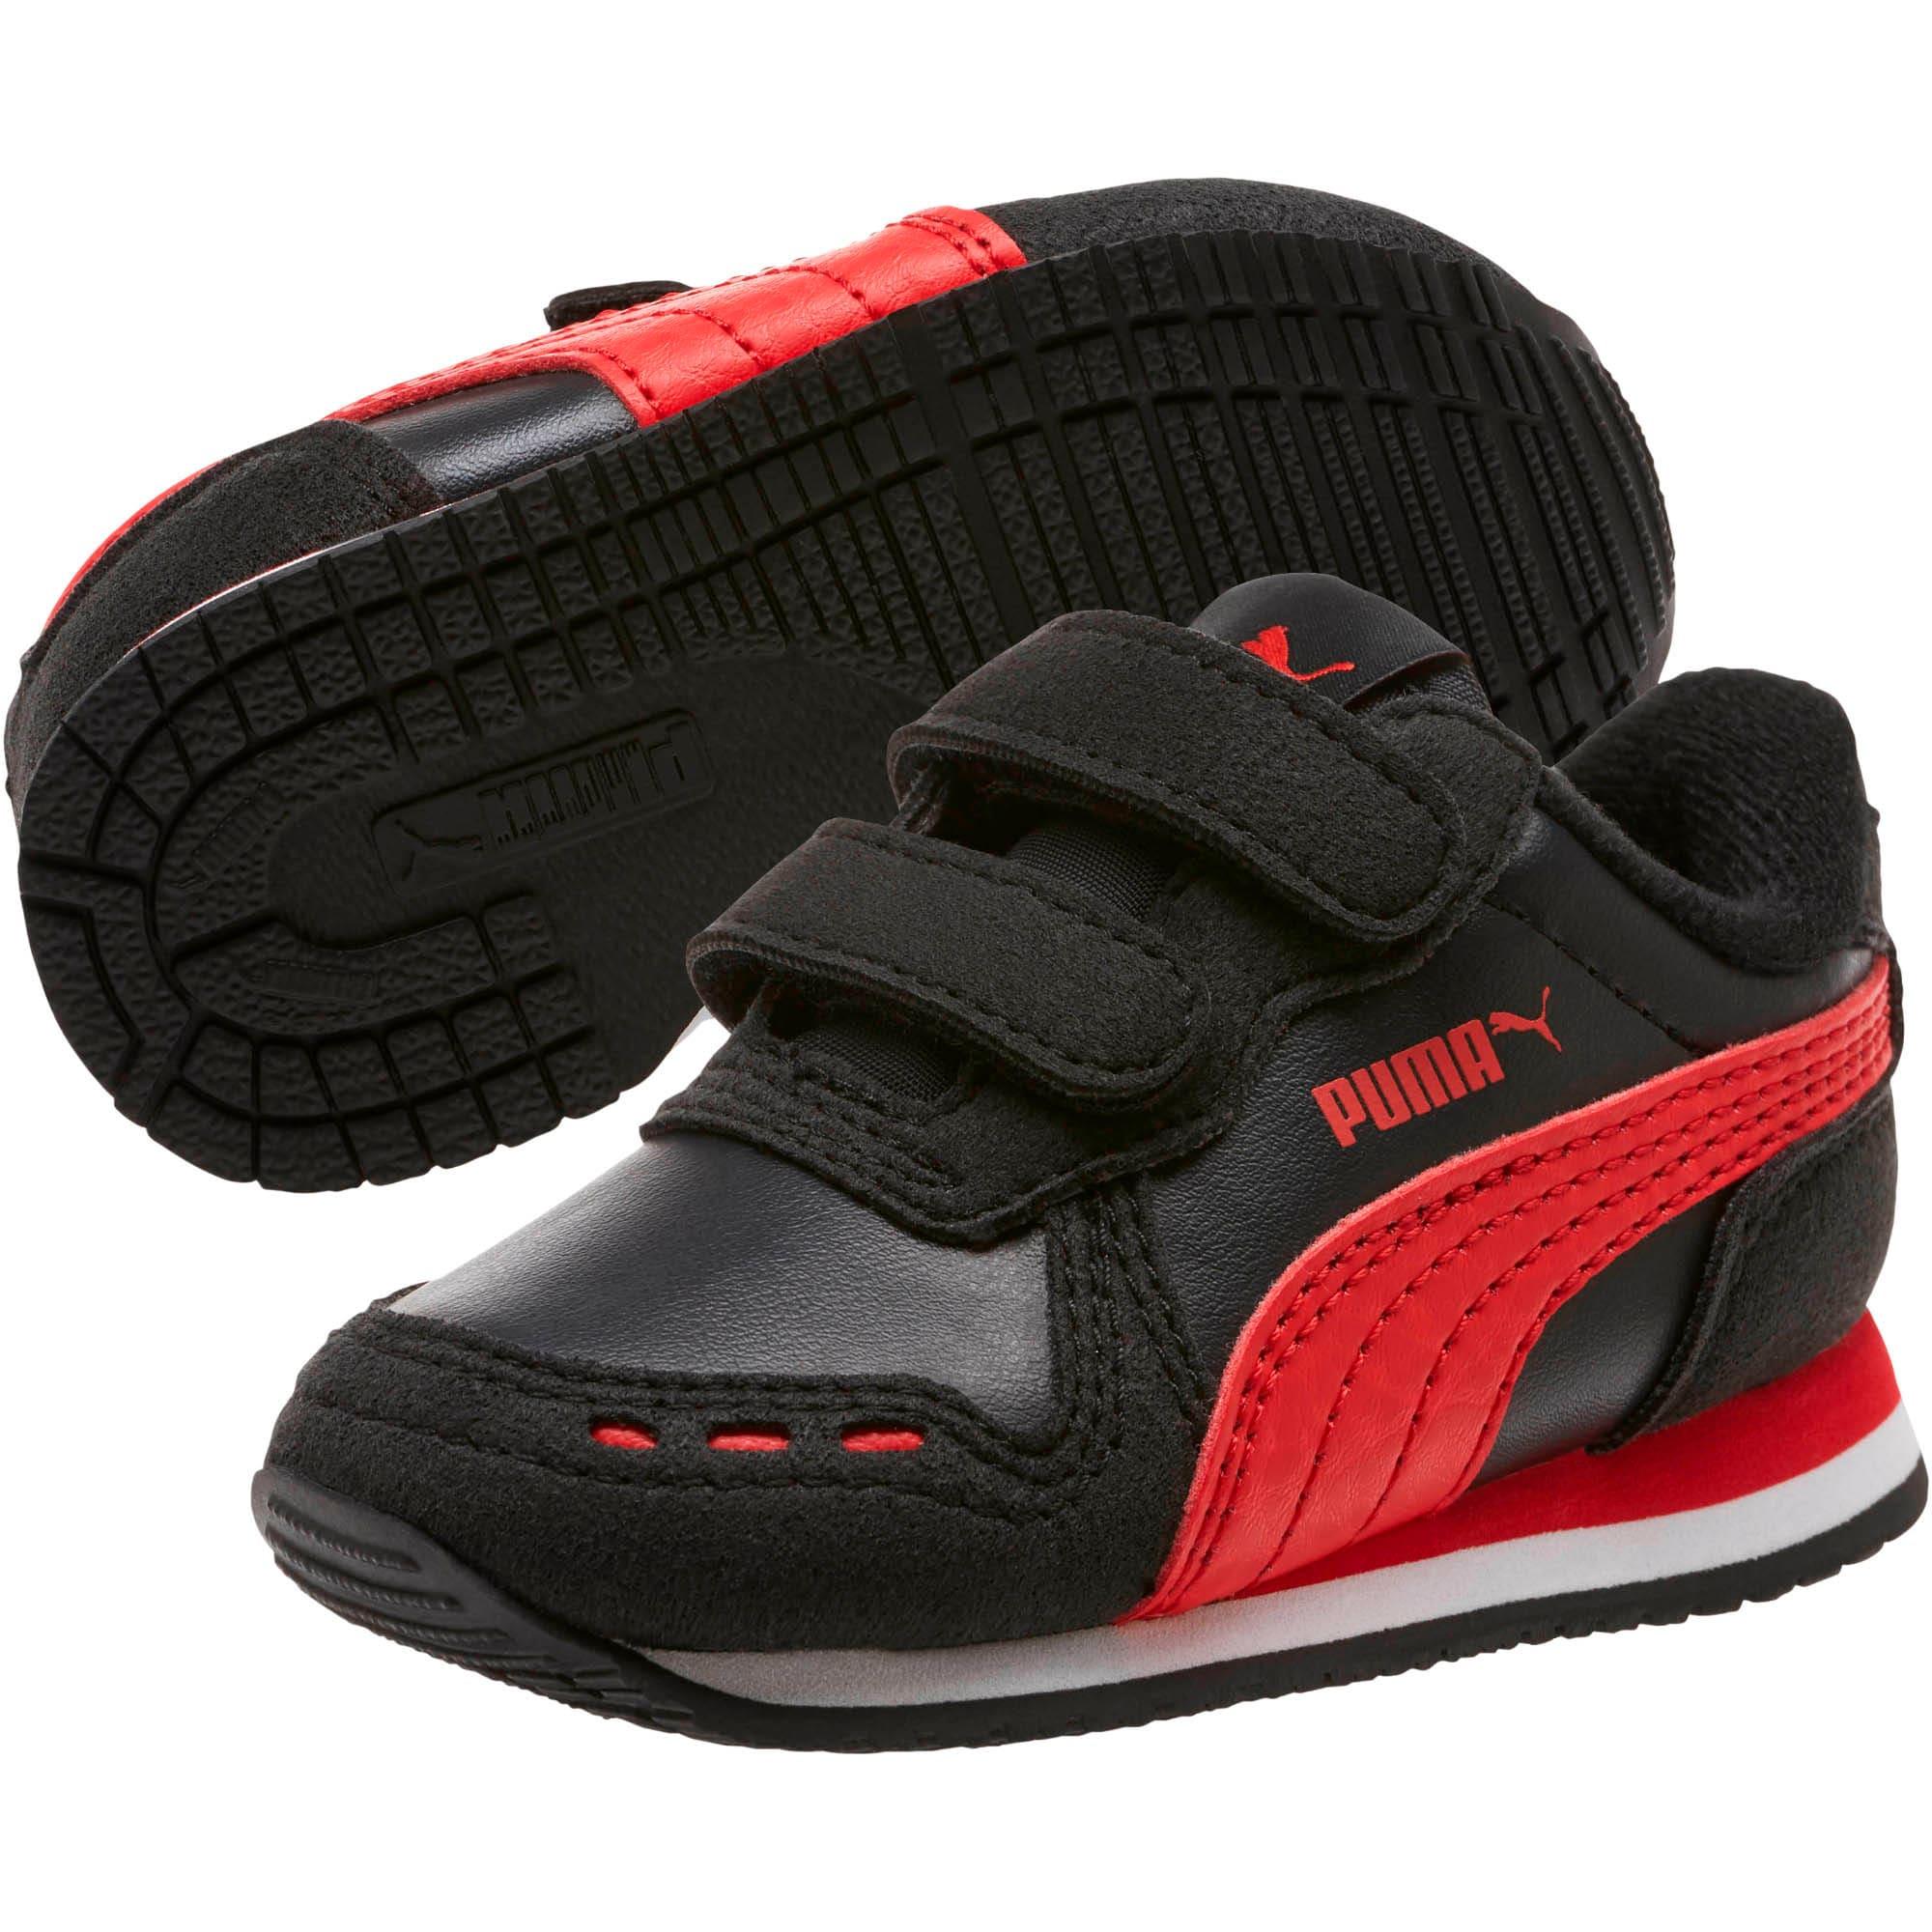 Thumbnail 2 of Cabana Racer SL Toddler Shoes, Puma Black-High Risk Red, medium